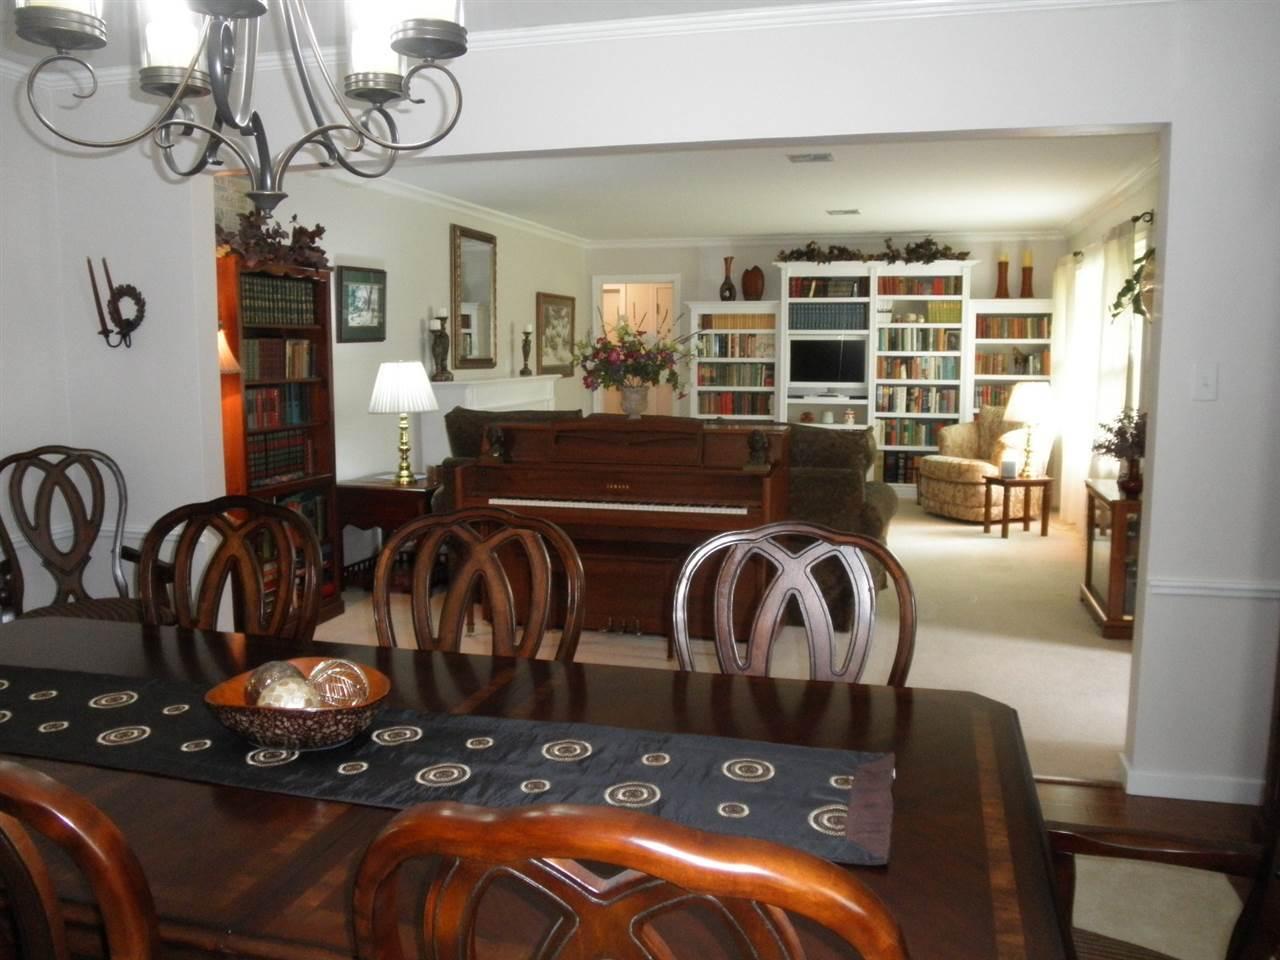 Sold Cross Sale W/ MLS | 127 Fairview  Ponca City, OK 74601 3